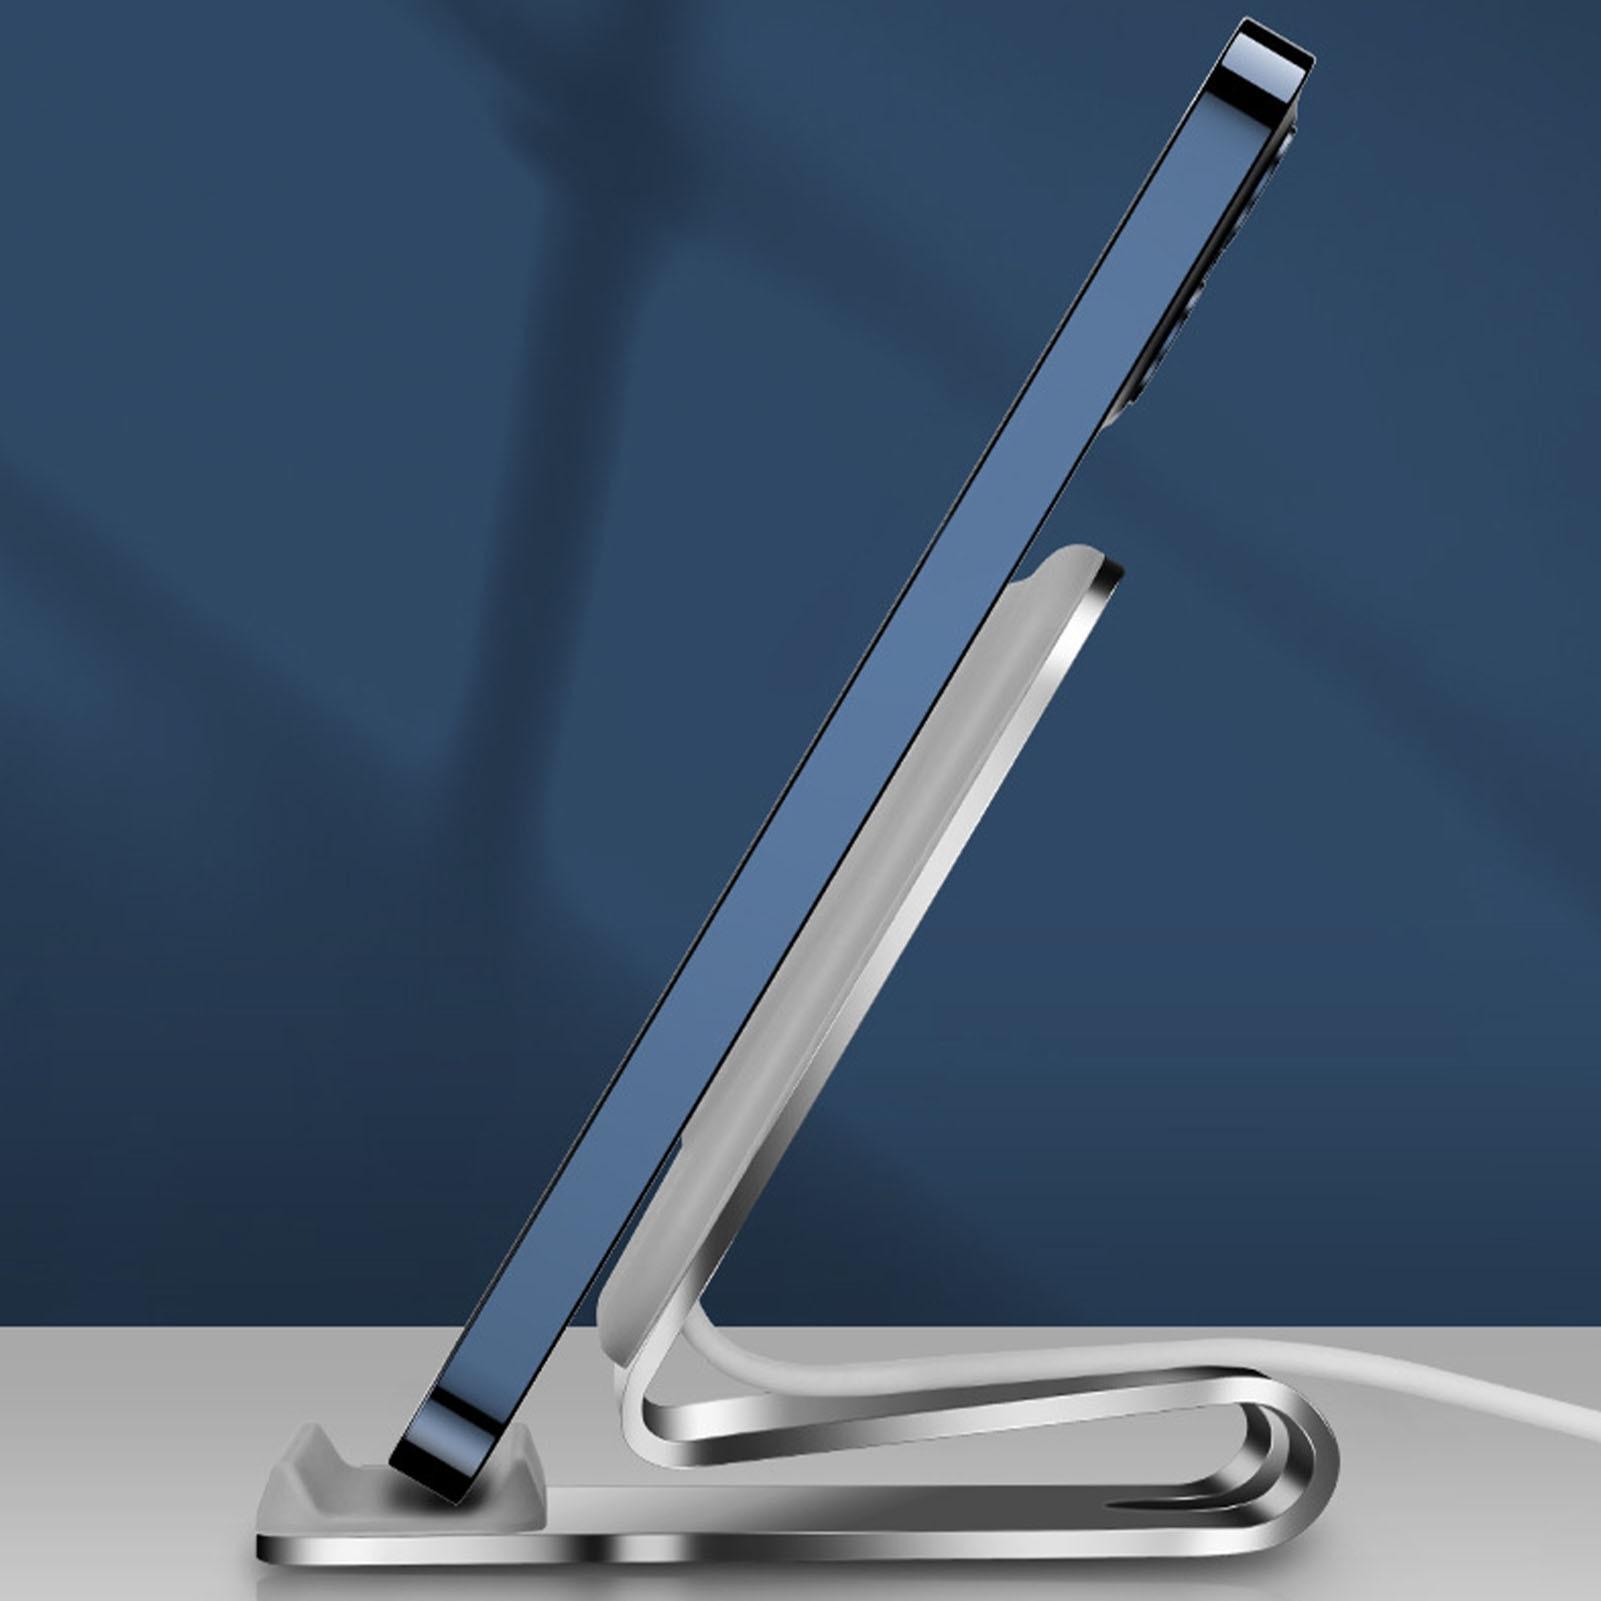 Rondaful Non-slip Wireless Magnetic Phone Charger Stand Holder For IPhone 12 Magsafe Desk Power Base Dock Cradle Bracket enlarge